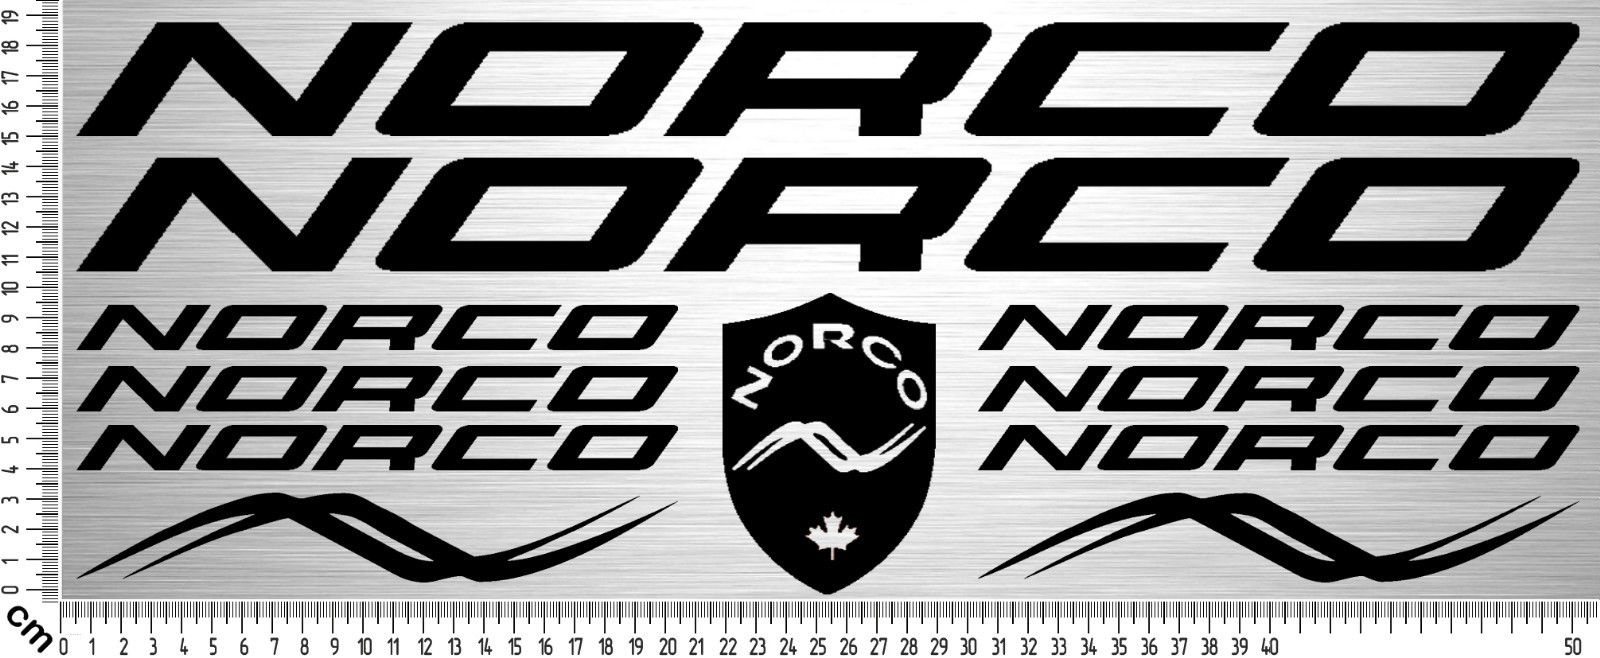 For 11x NORCO BIKES Sticker Set | Fahrrad Rahmen Aufkleber | Bike ...